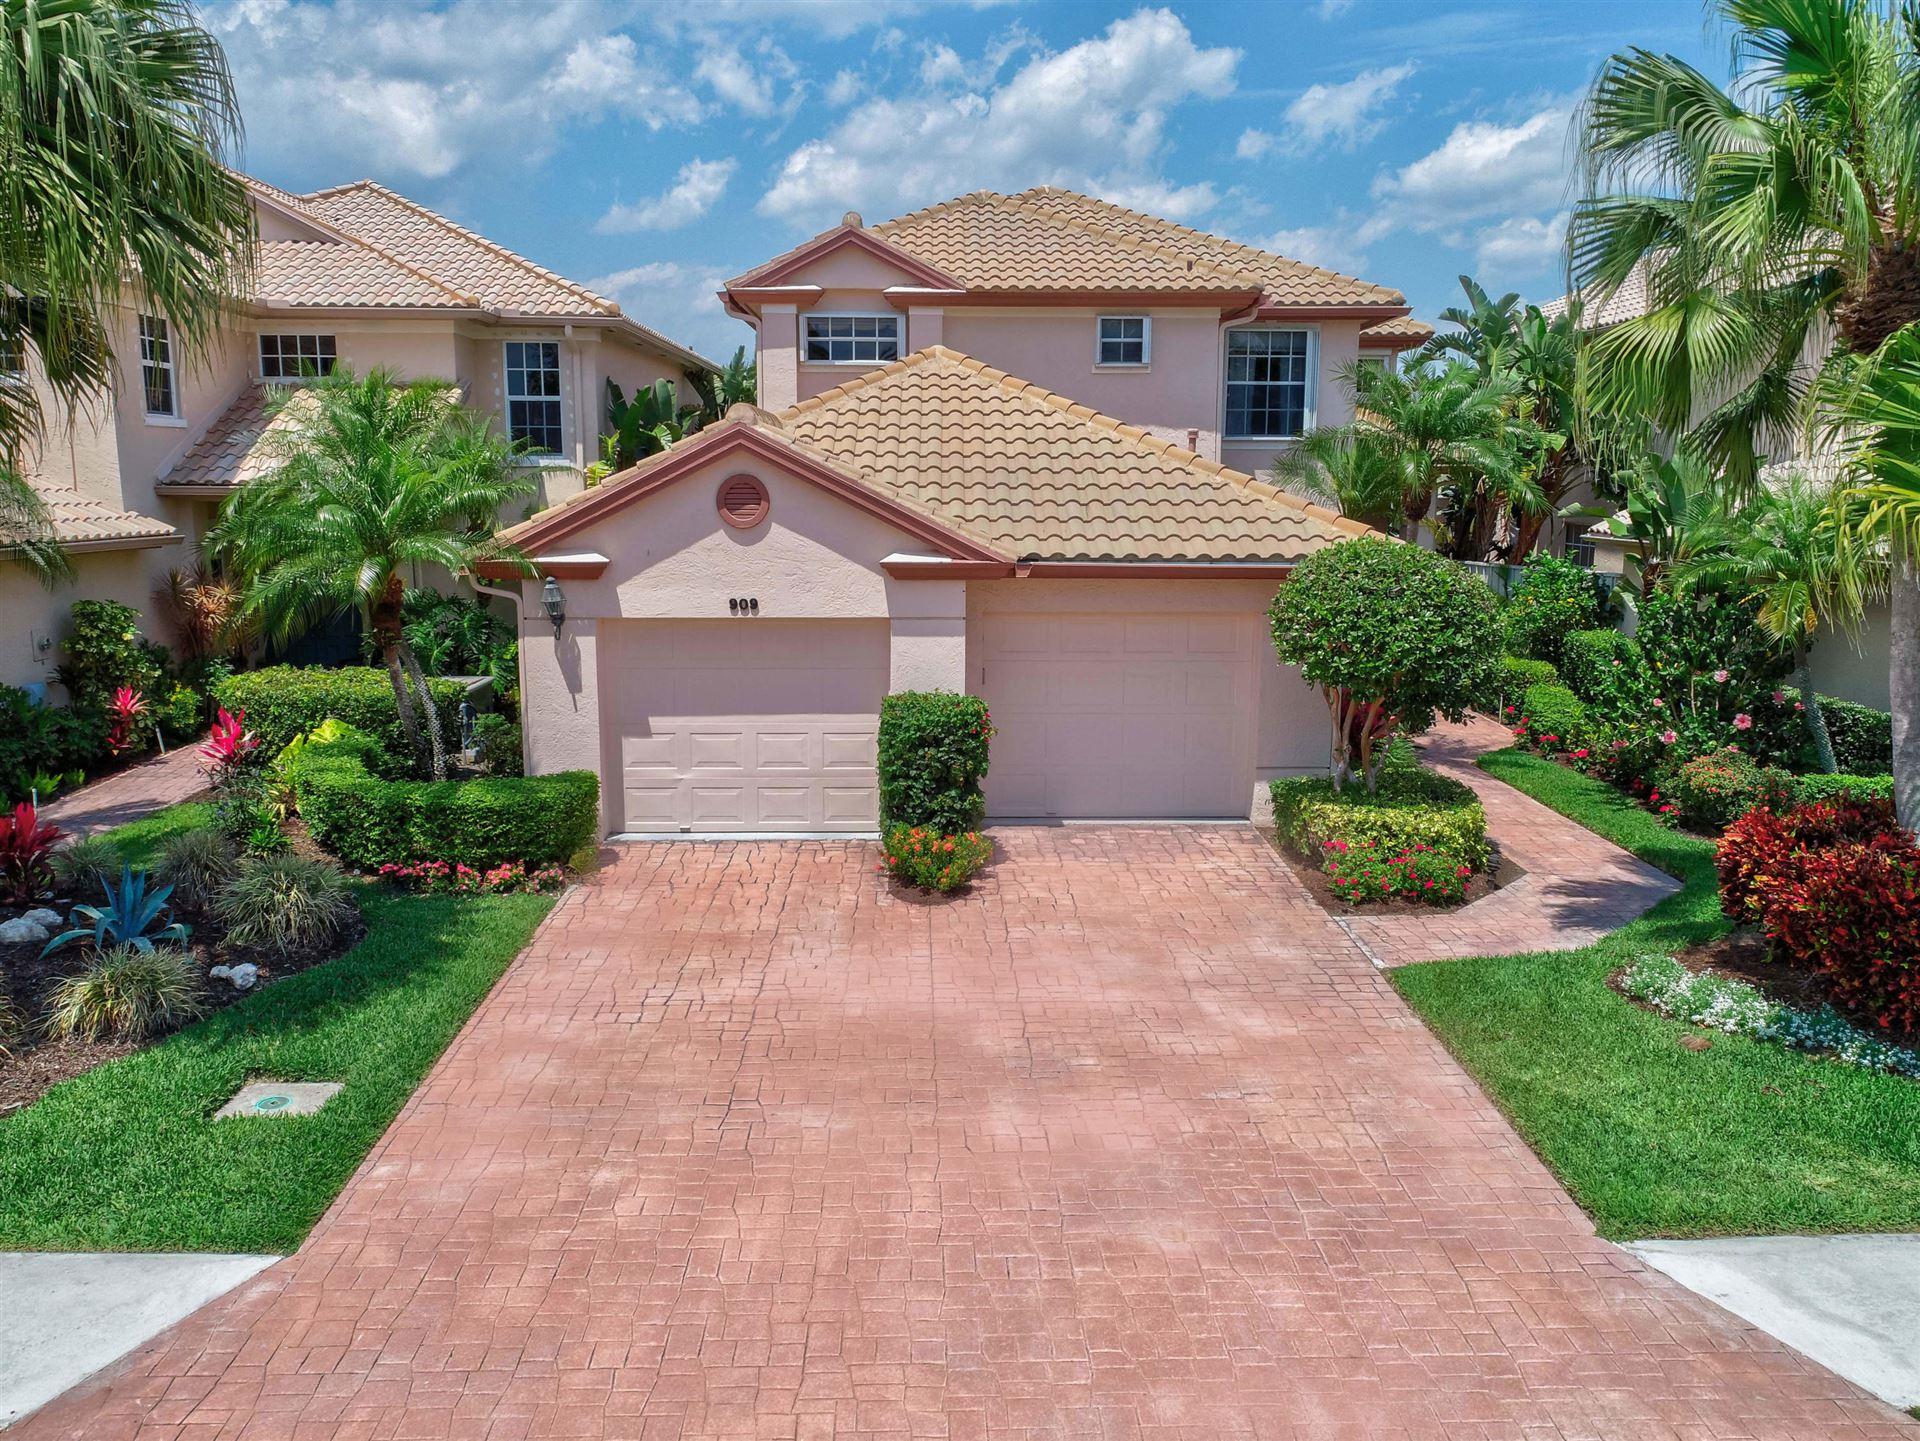 Photo of 909 Augusta Pointe Drive, Palm Beach Gardens, FL 33418 (MLS # RX-10709061)